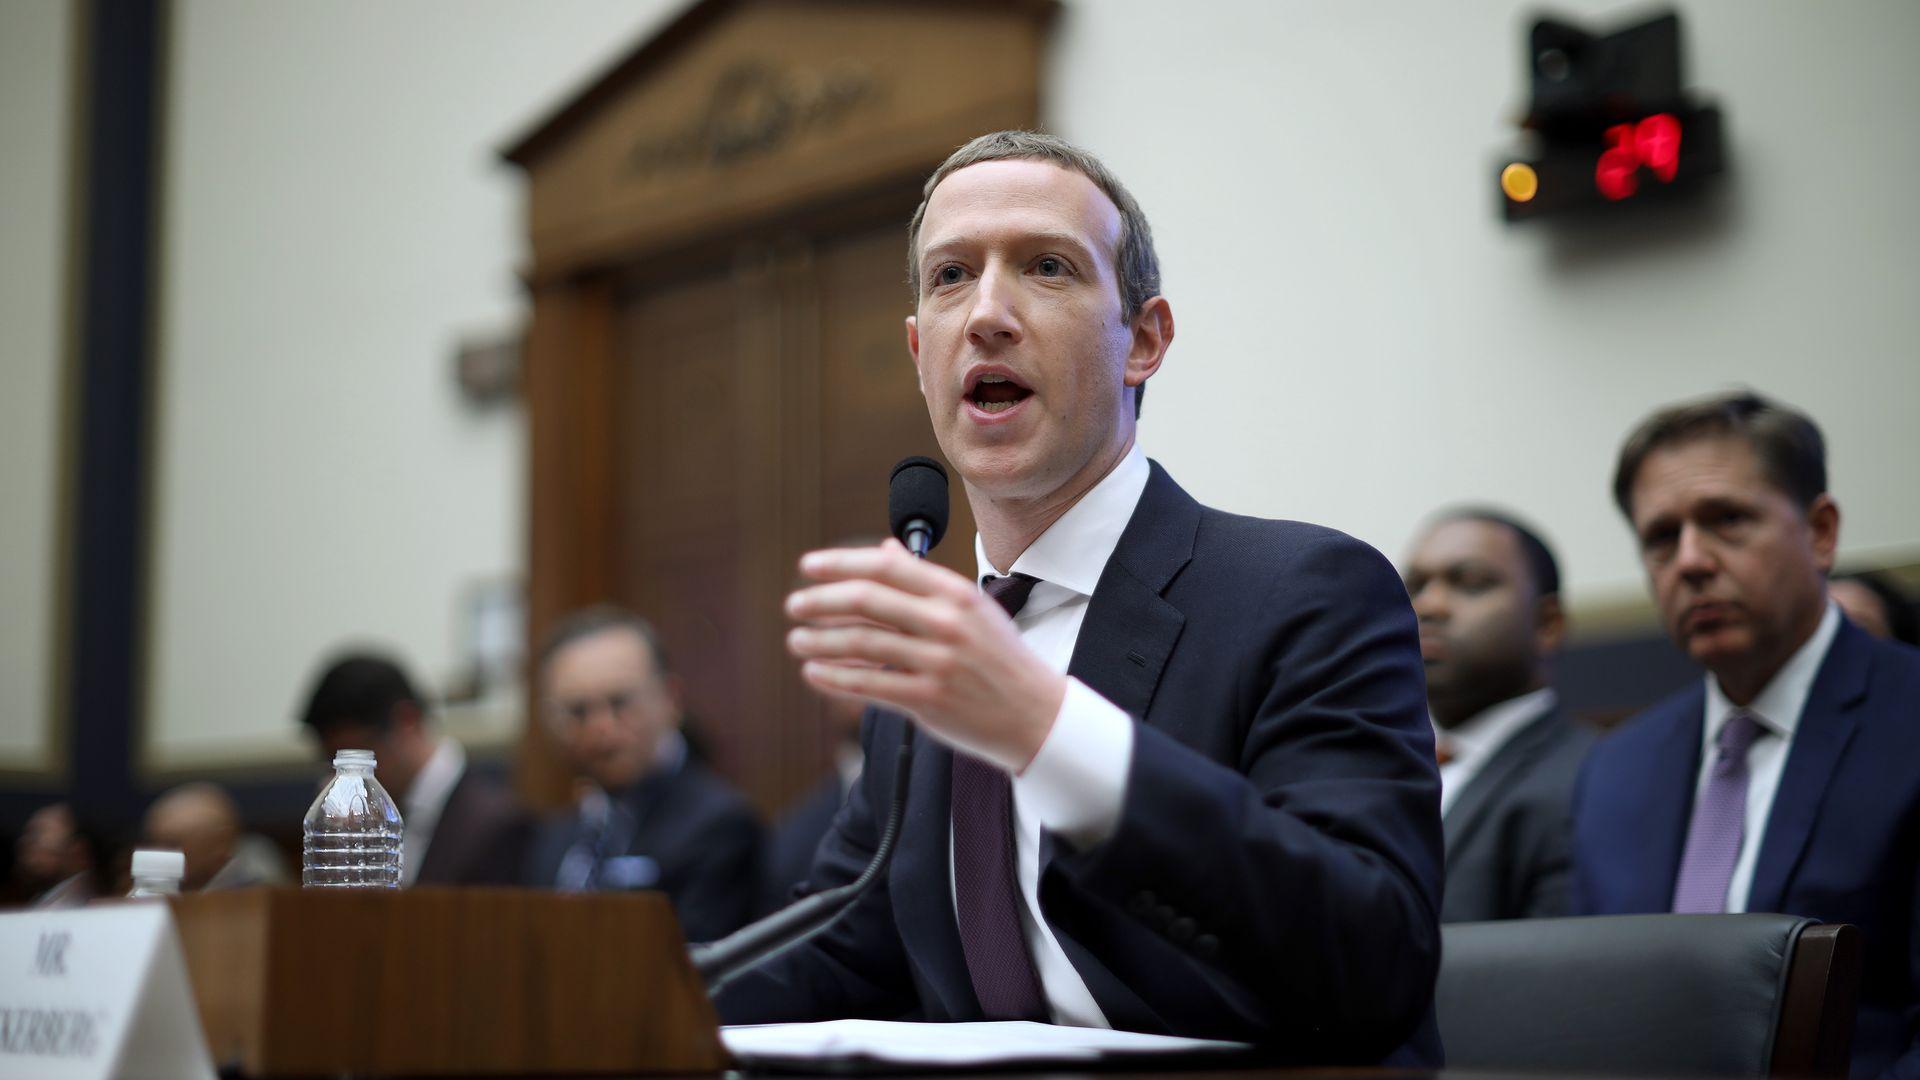 Mark Zuckerberg assailed from all directions in Hill marathon